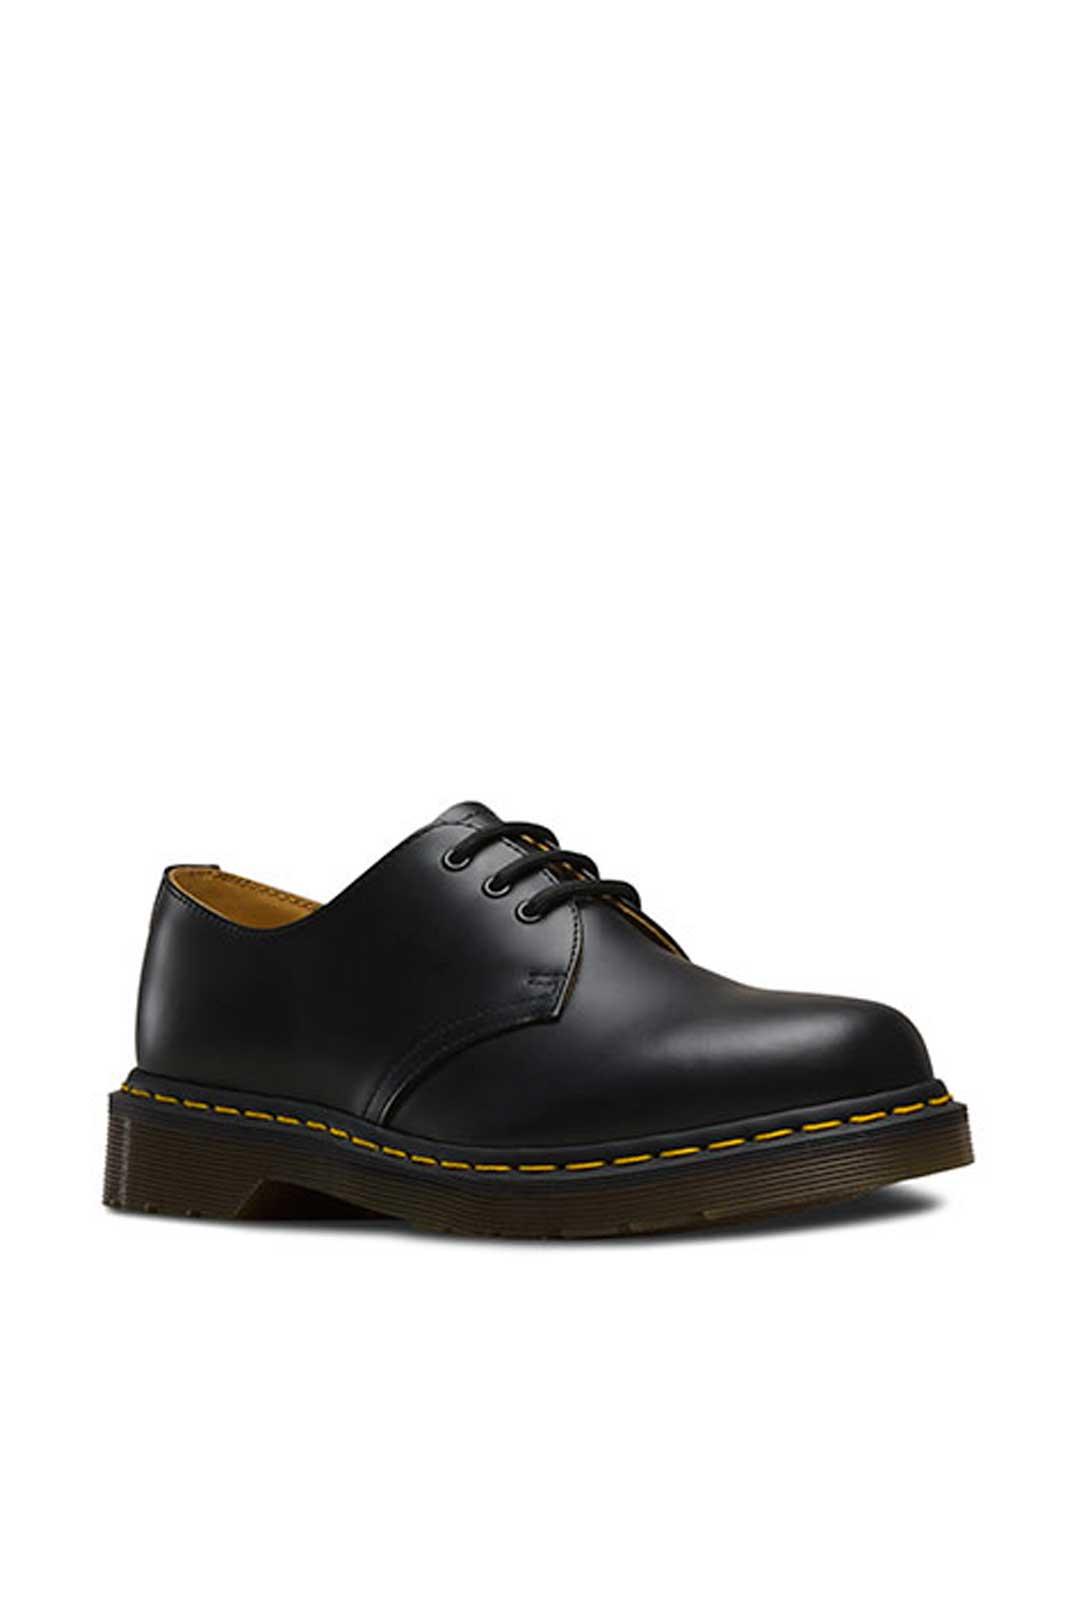 dr martens 1461z-3-eye-shoes